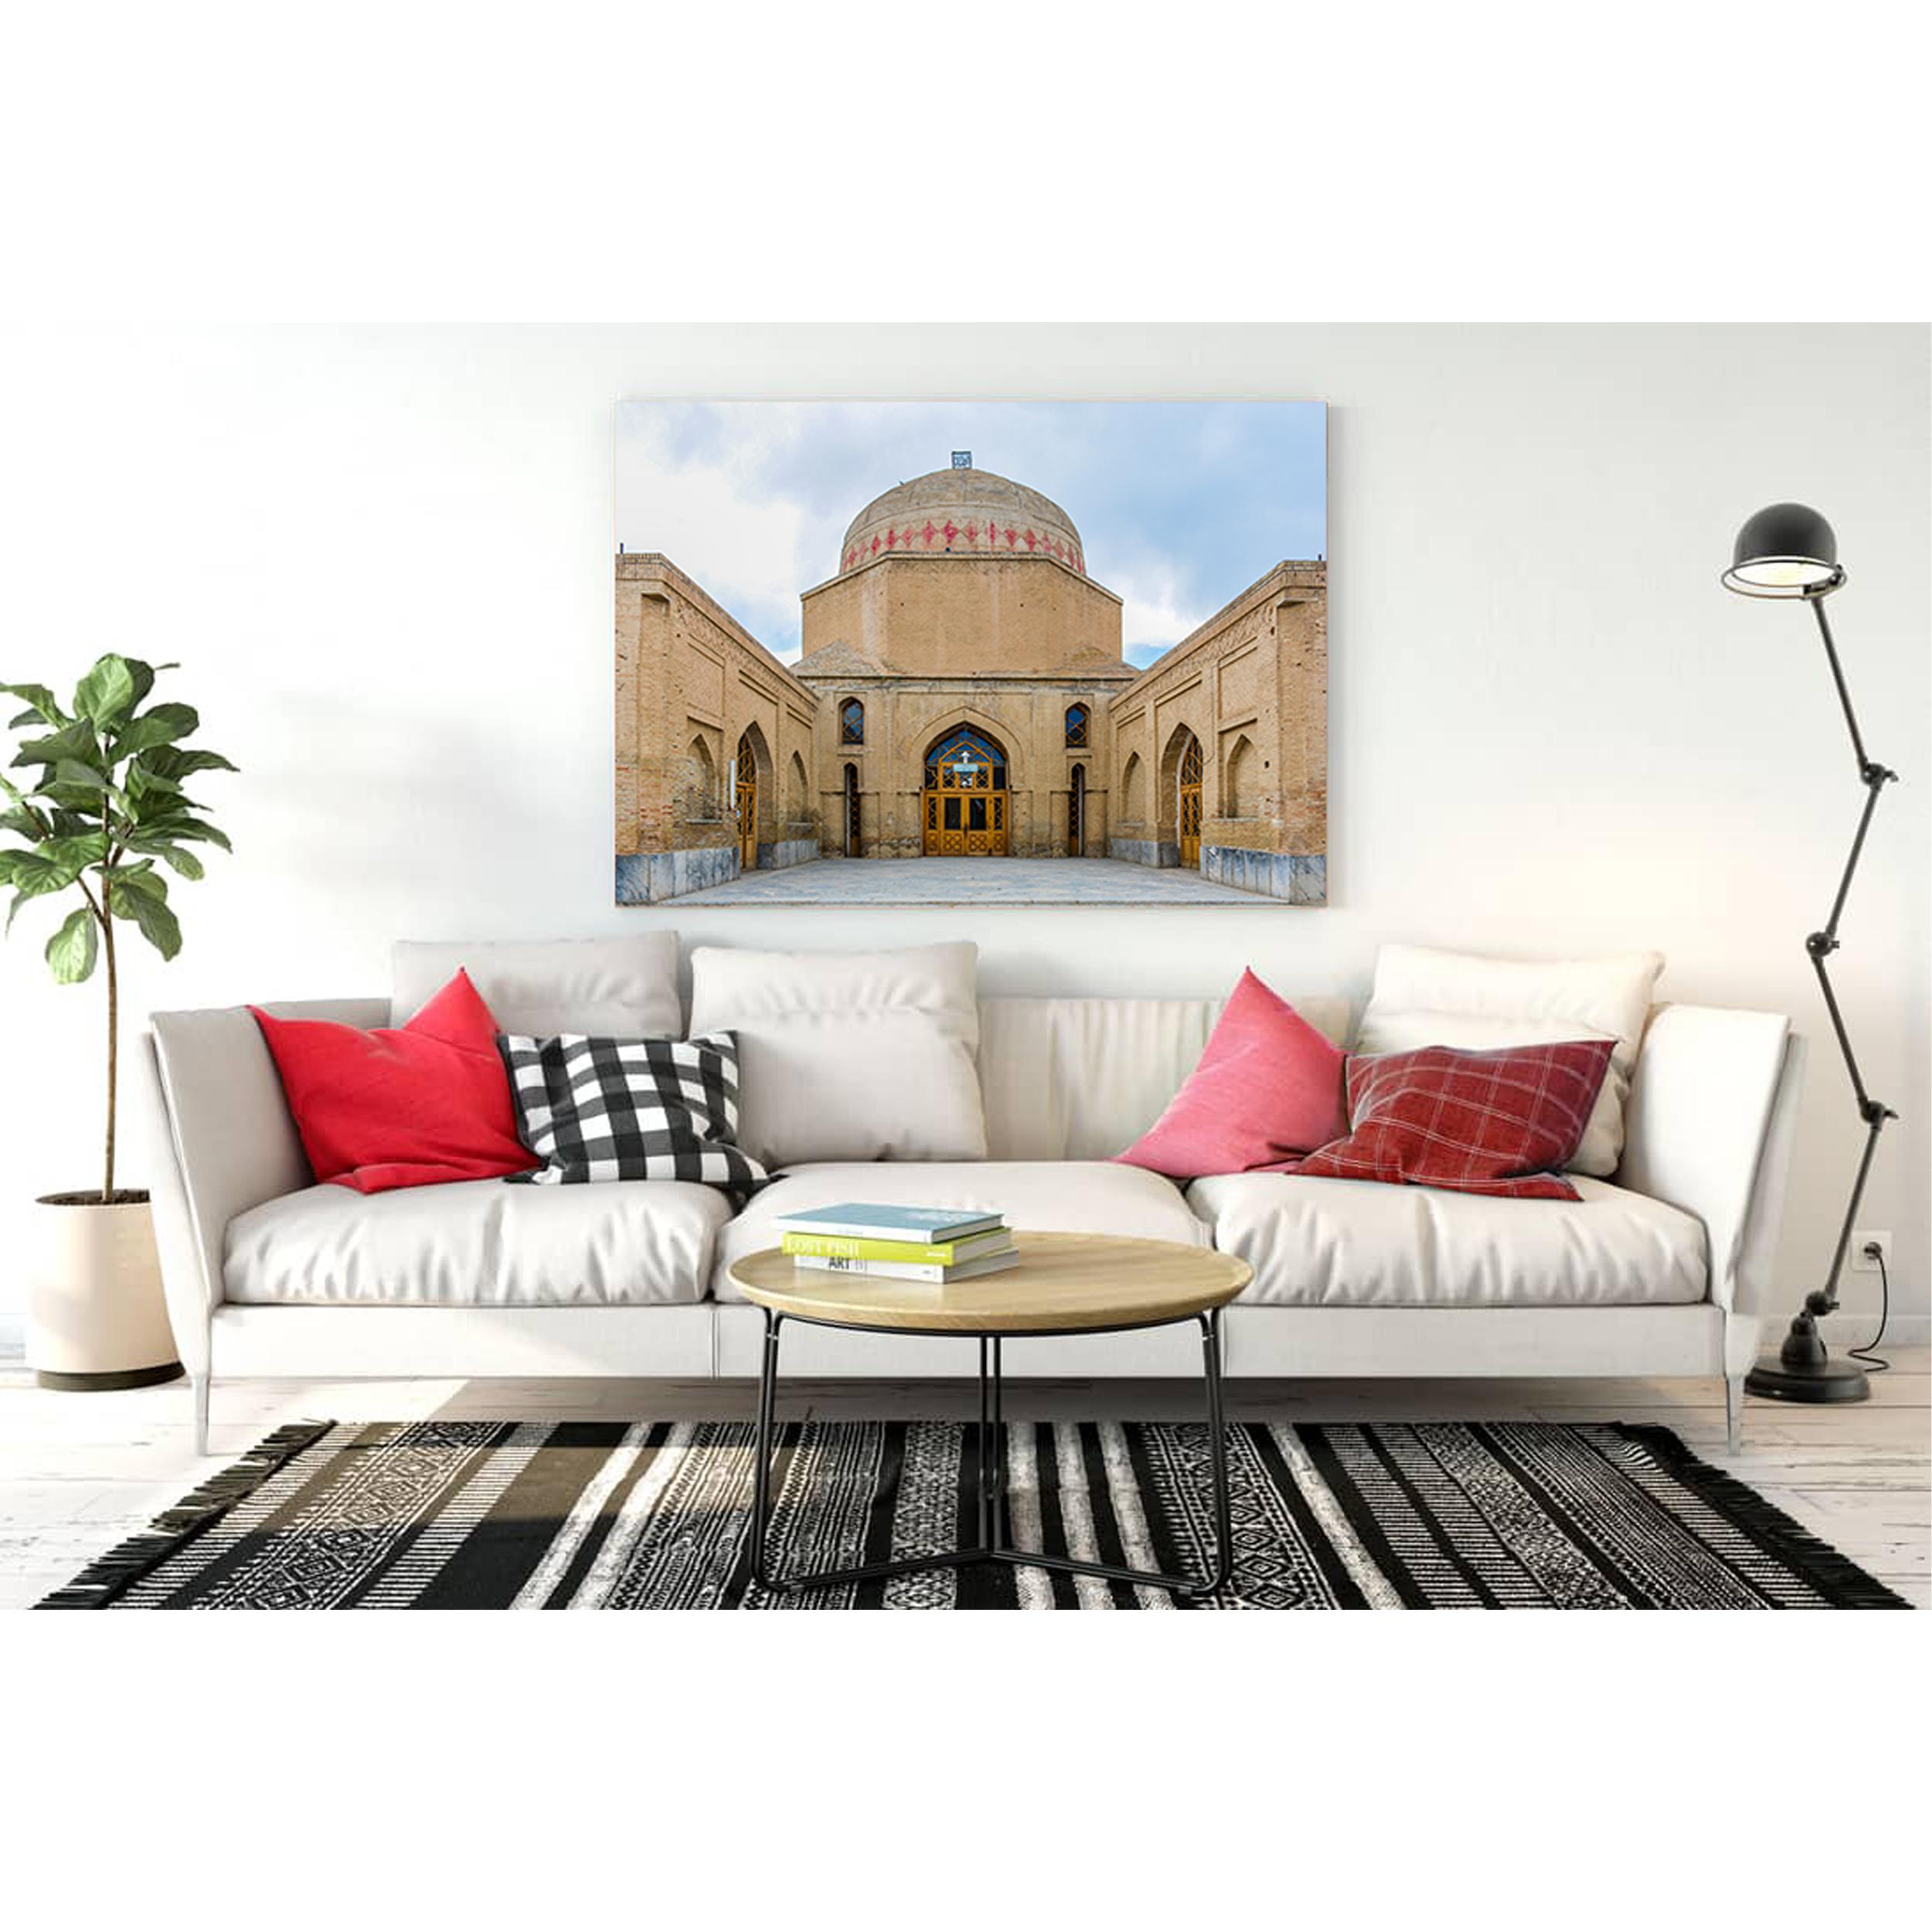 تابلو شاسی طرح مسجد سلجوقی کد 0109